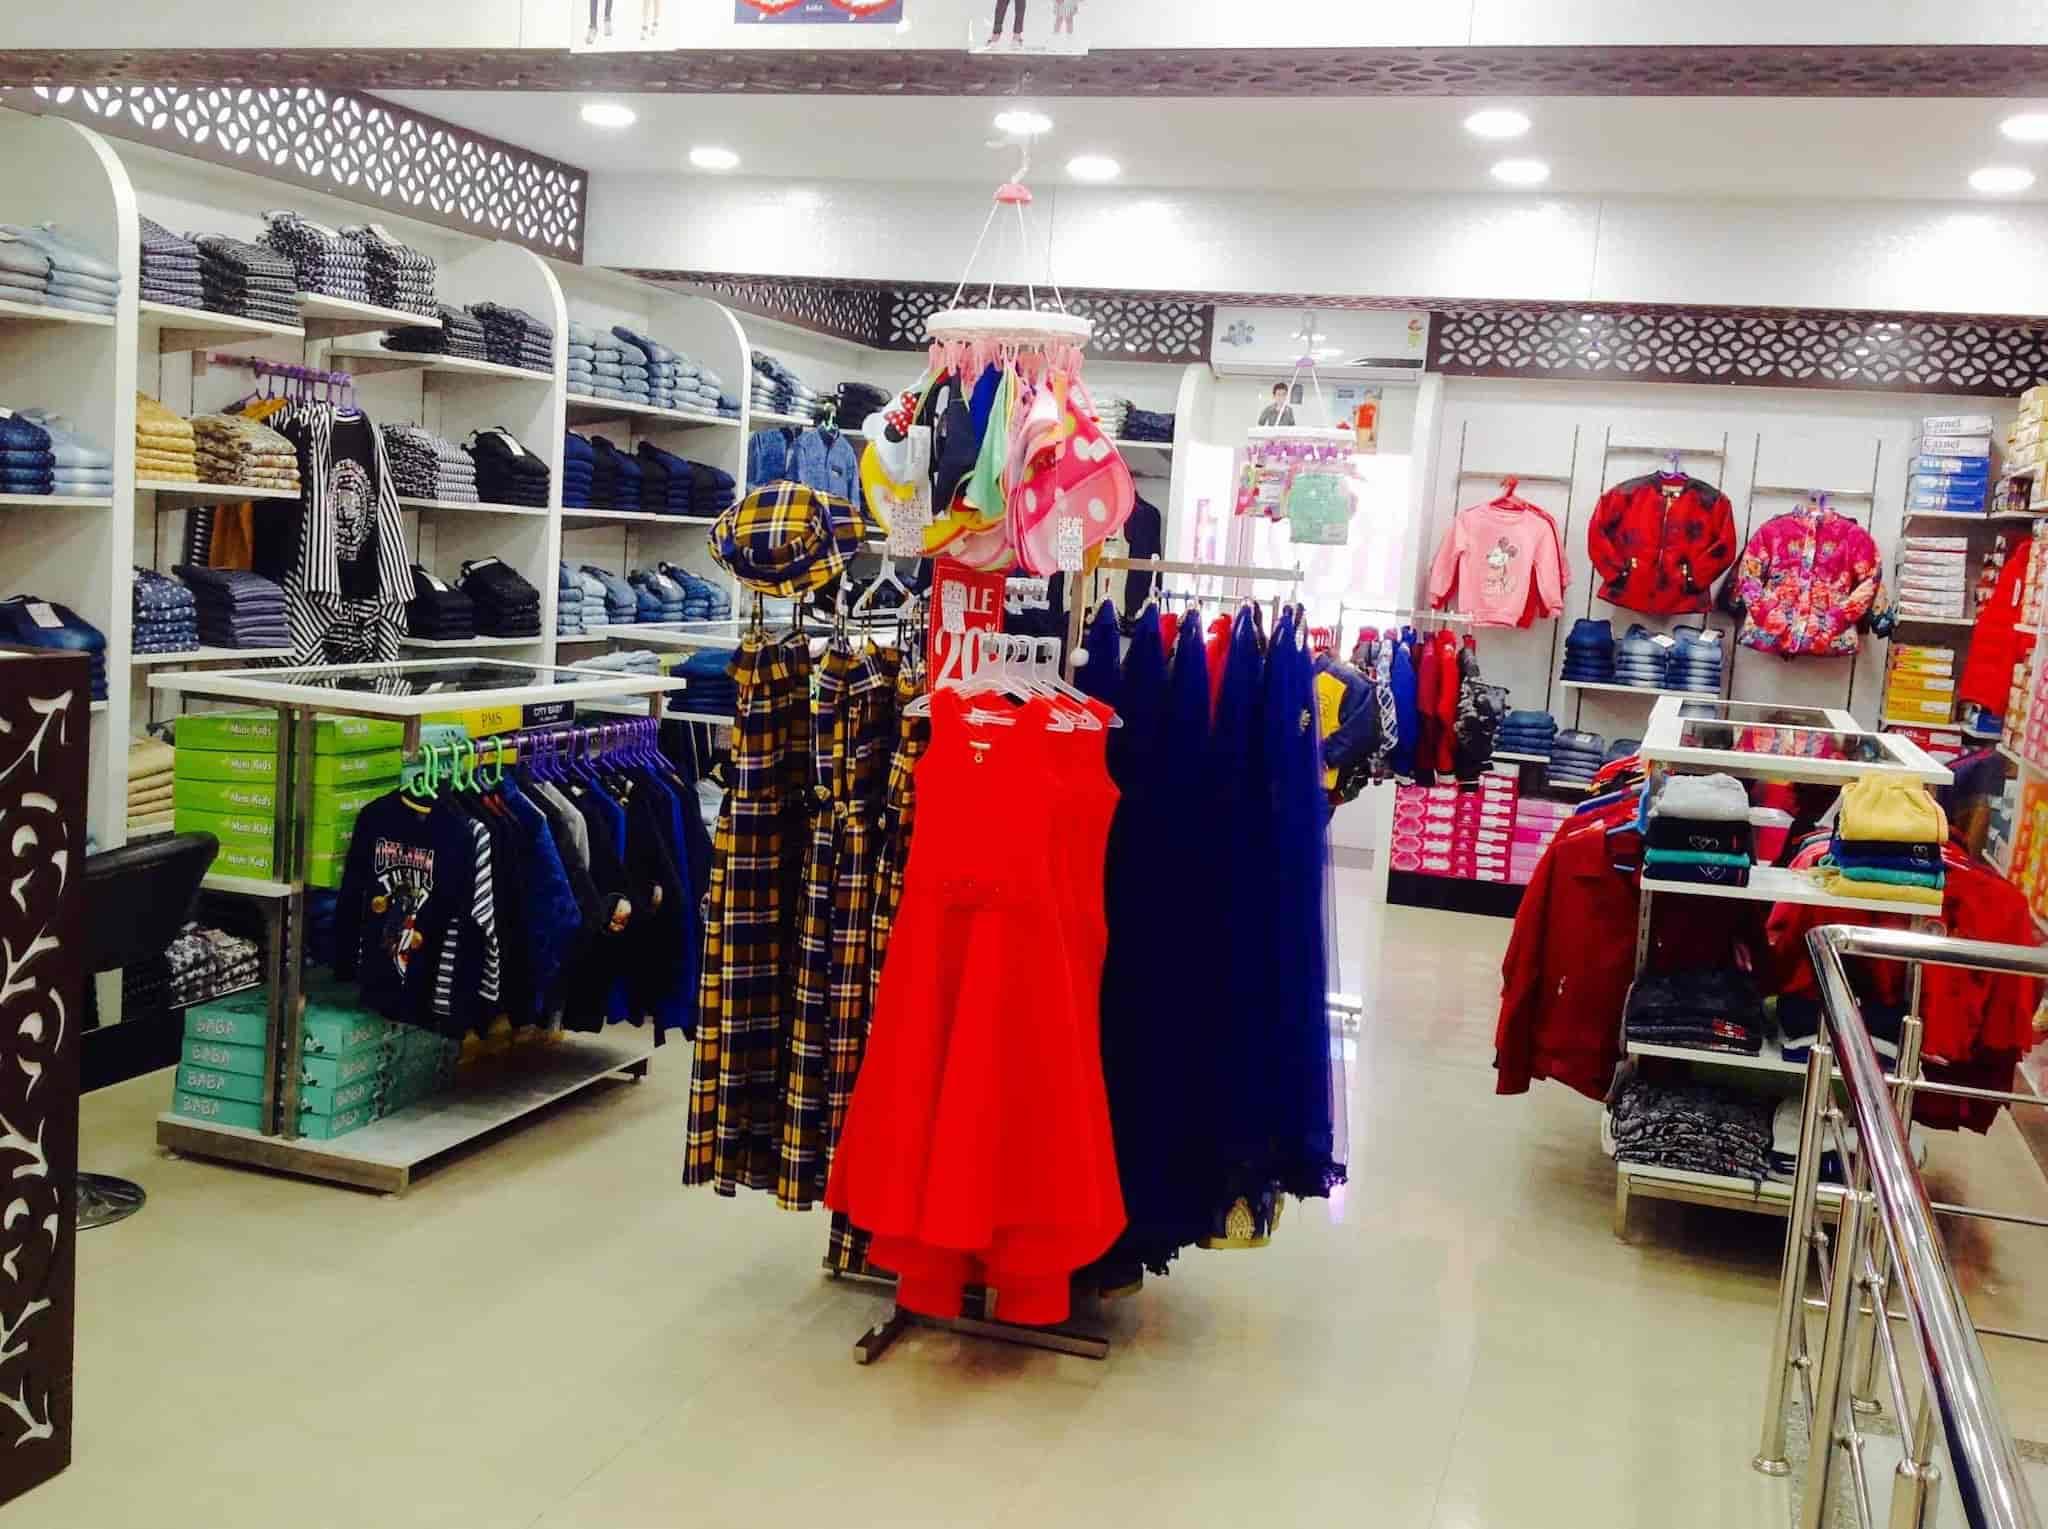 experimental misericordia Nabo  Dignity Kids Wear, Dehradun City - Readymade Garment Retailers in Dehradun  - Justdial